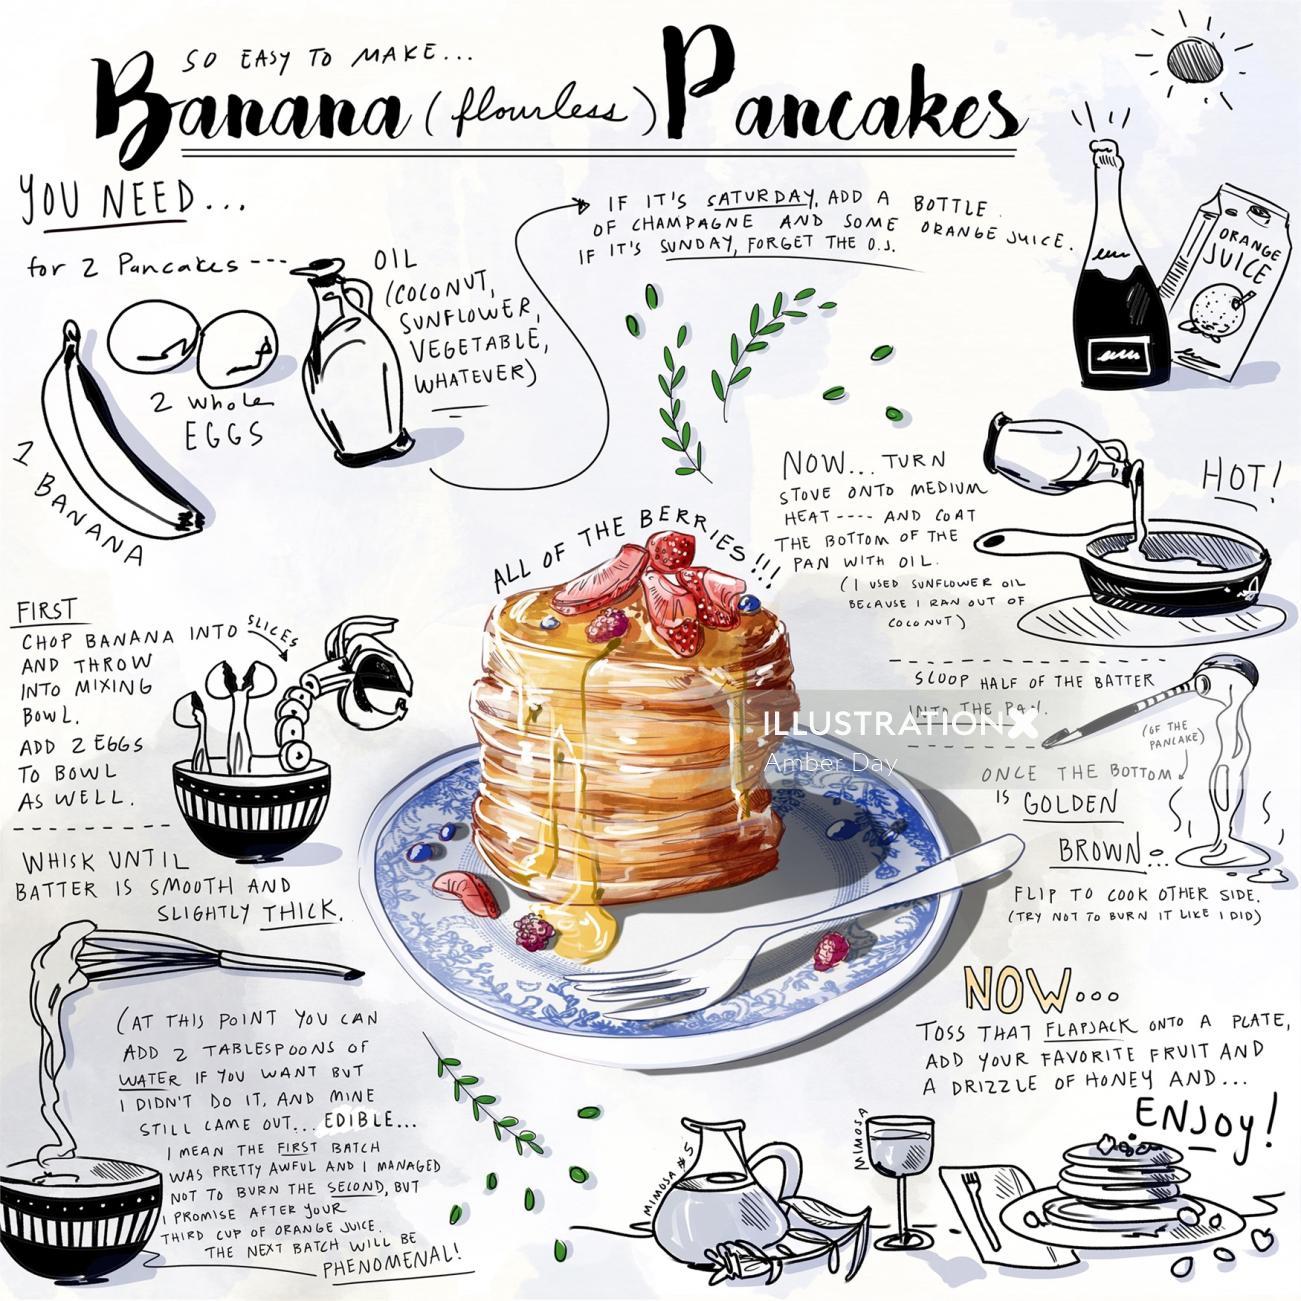 food, culinary, watercolor, ink, loose, wash, bread, vegetable, produce